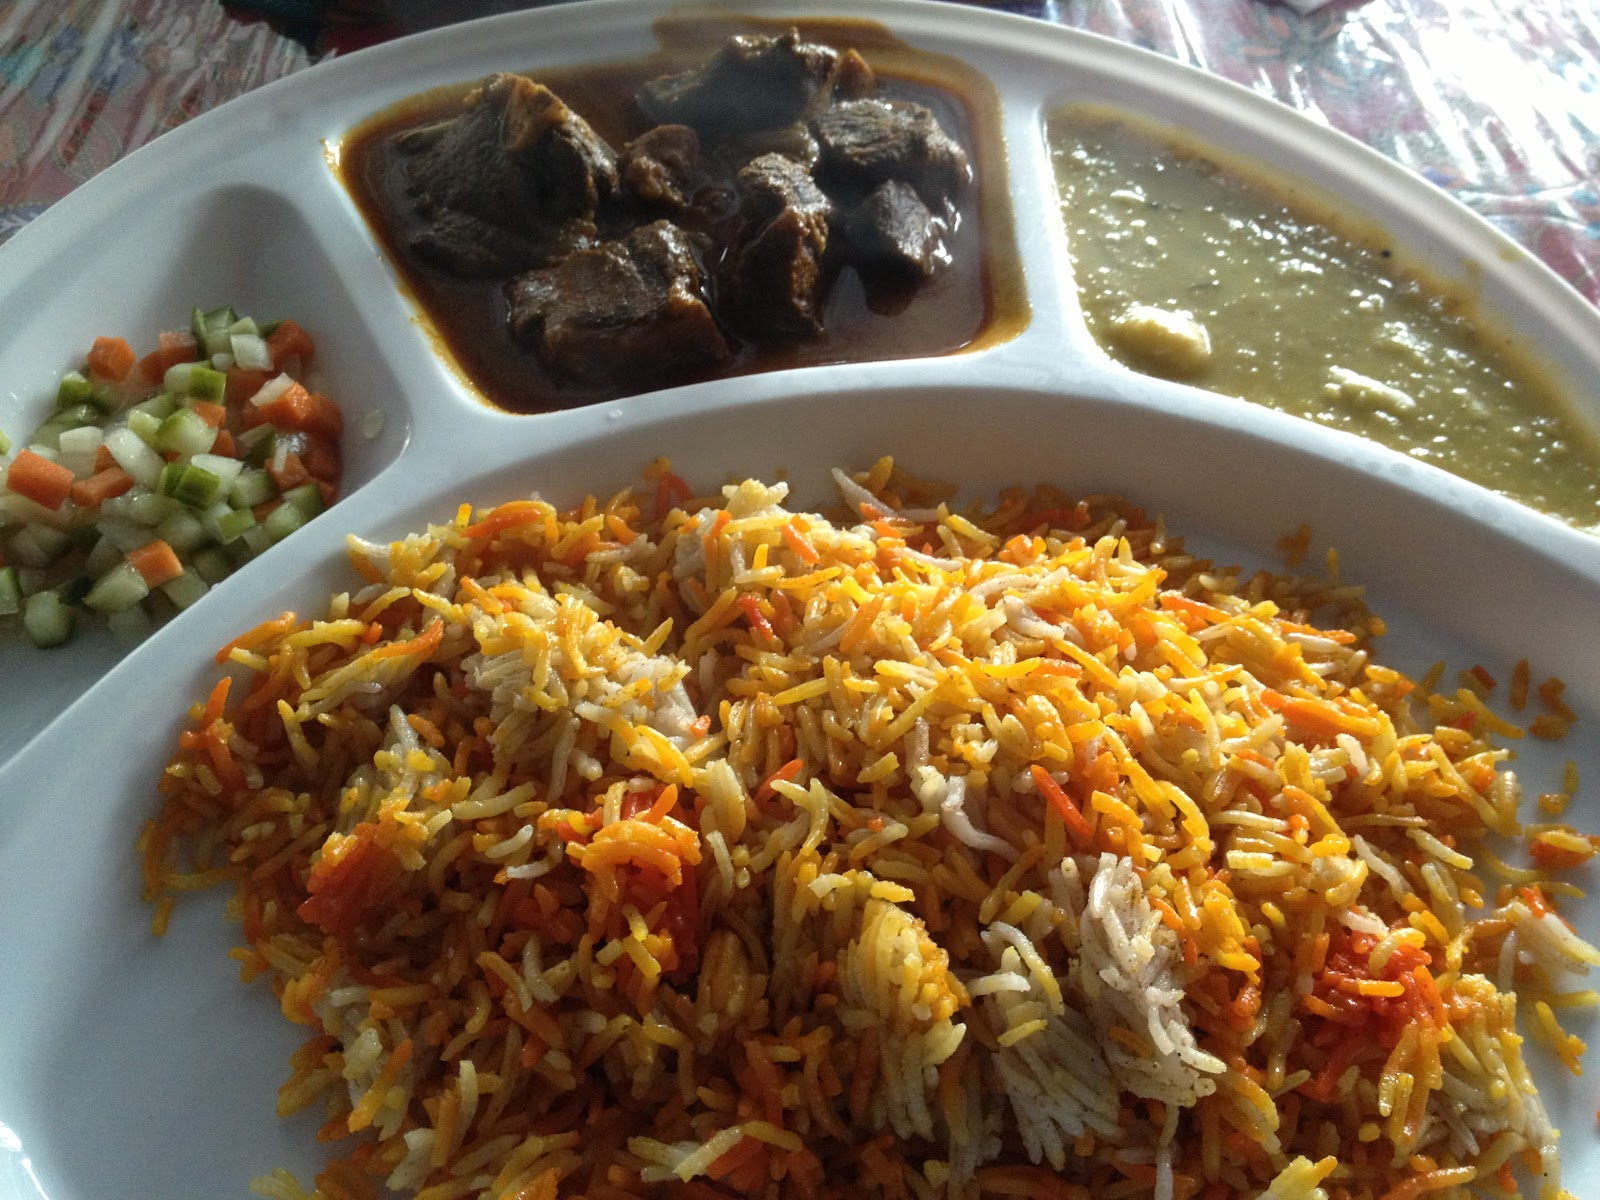 Asian restaurants in melbourne lazzat on lygon for Asian cuisine melbourne